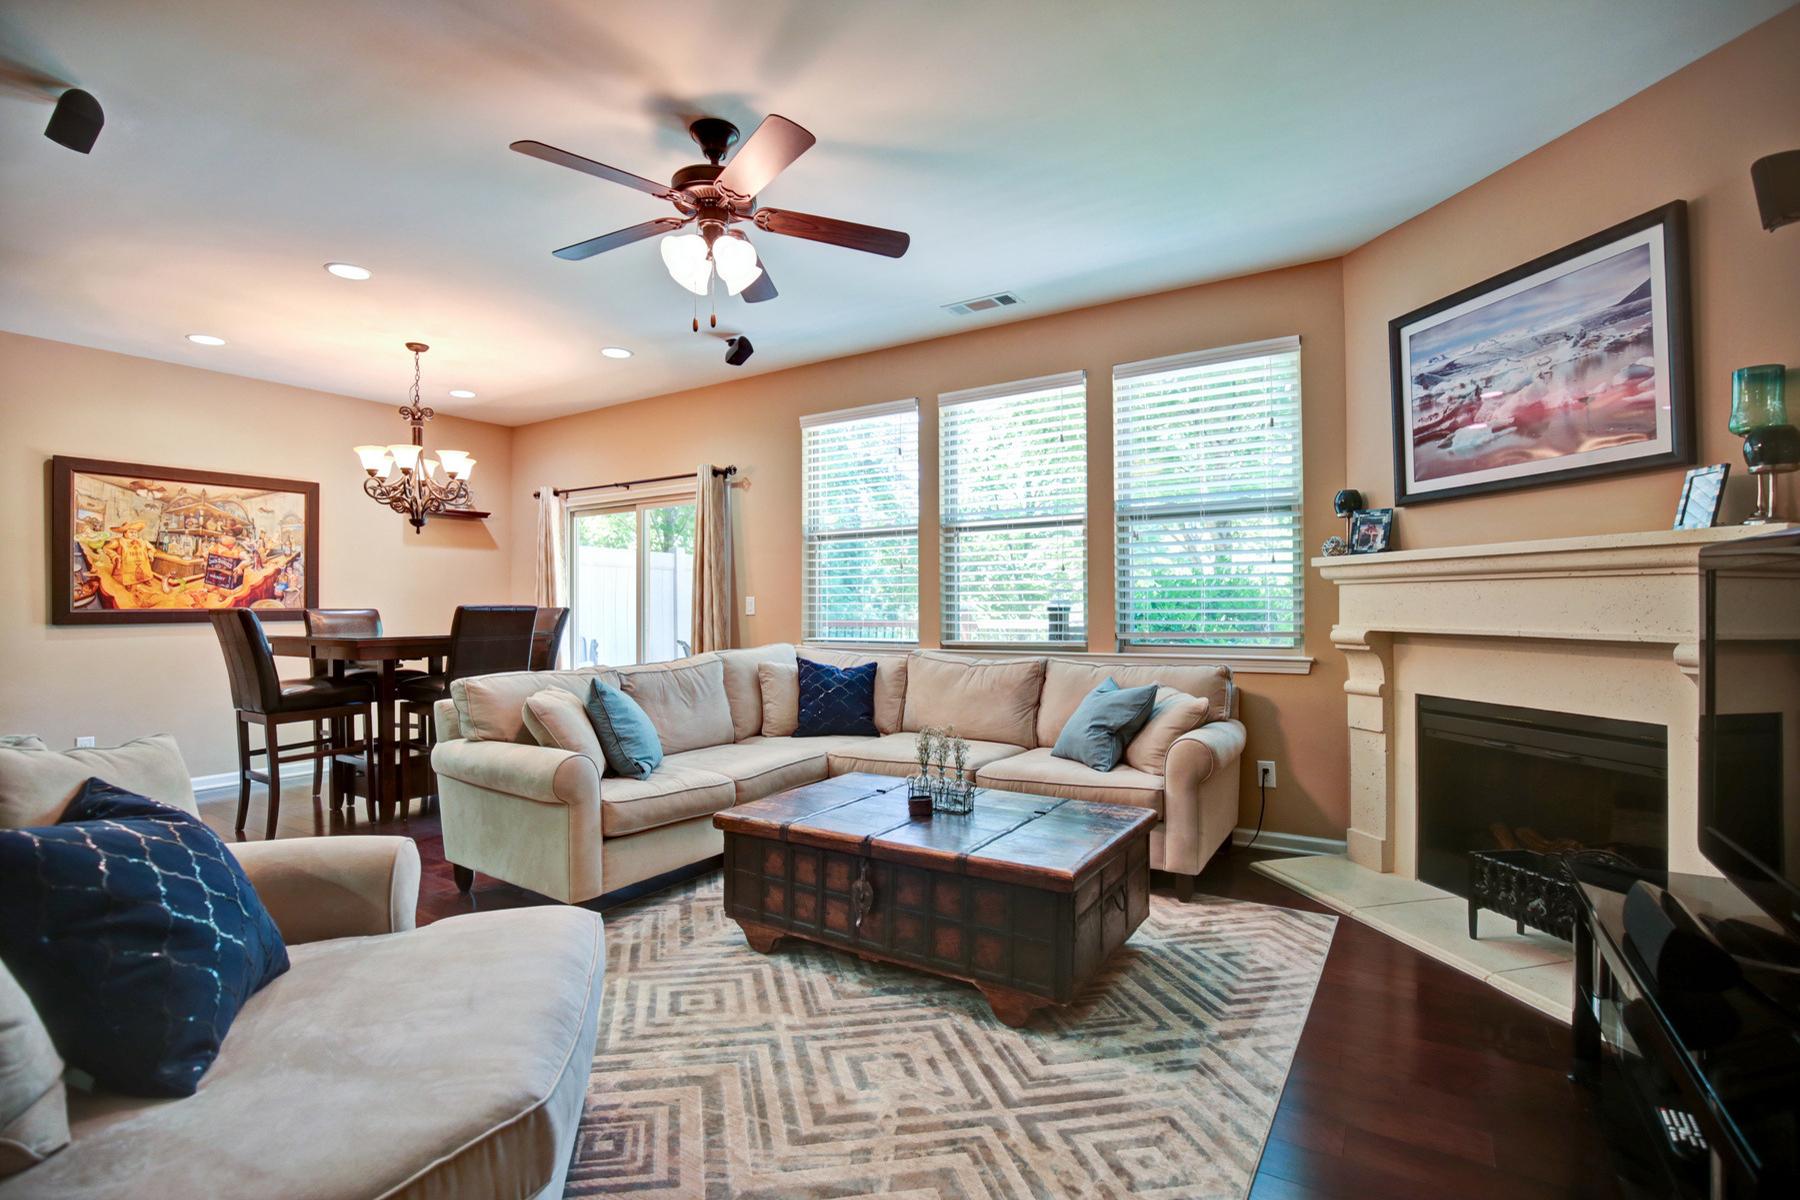 Residência urbana para Venda às Great Location In The City Of Brookhaven 1569 Trailview Way Atlanta, Geórgia, 30329 Estados Unidos